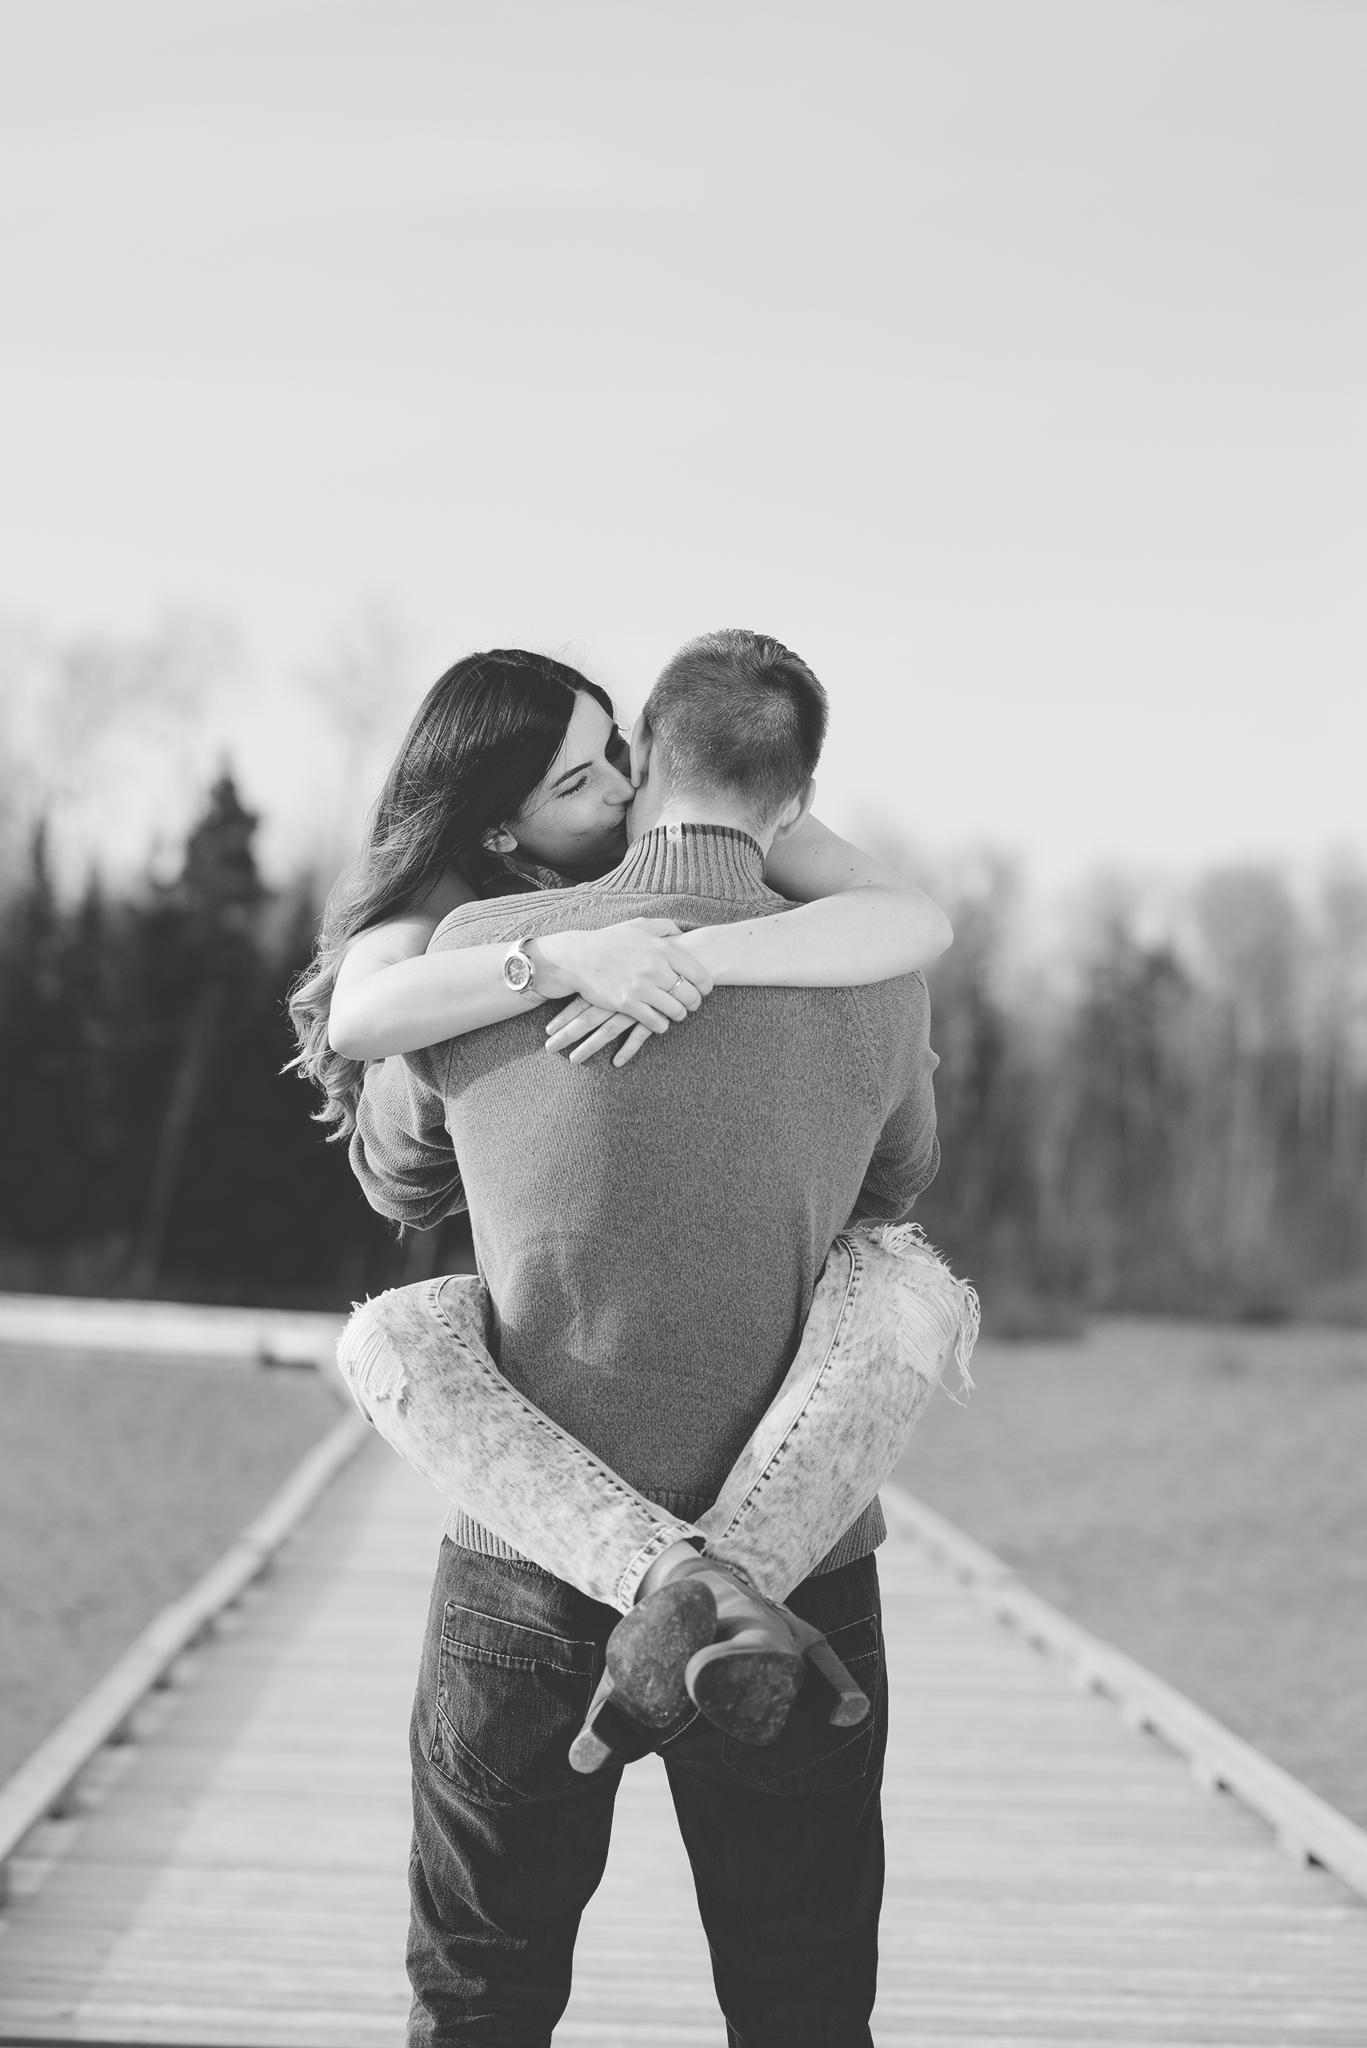 Sudbury engagement photography | Couple portrait